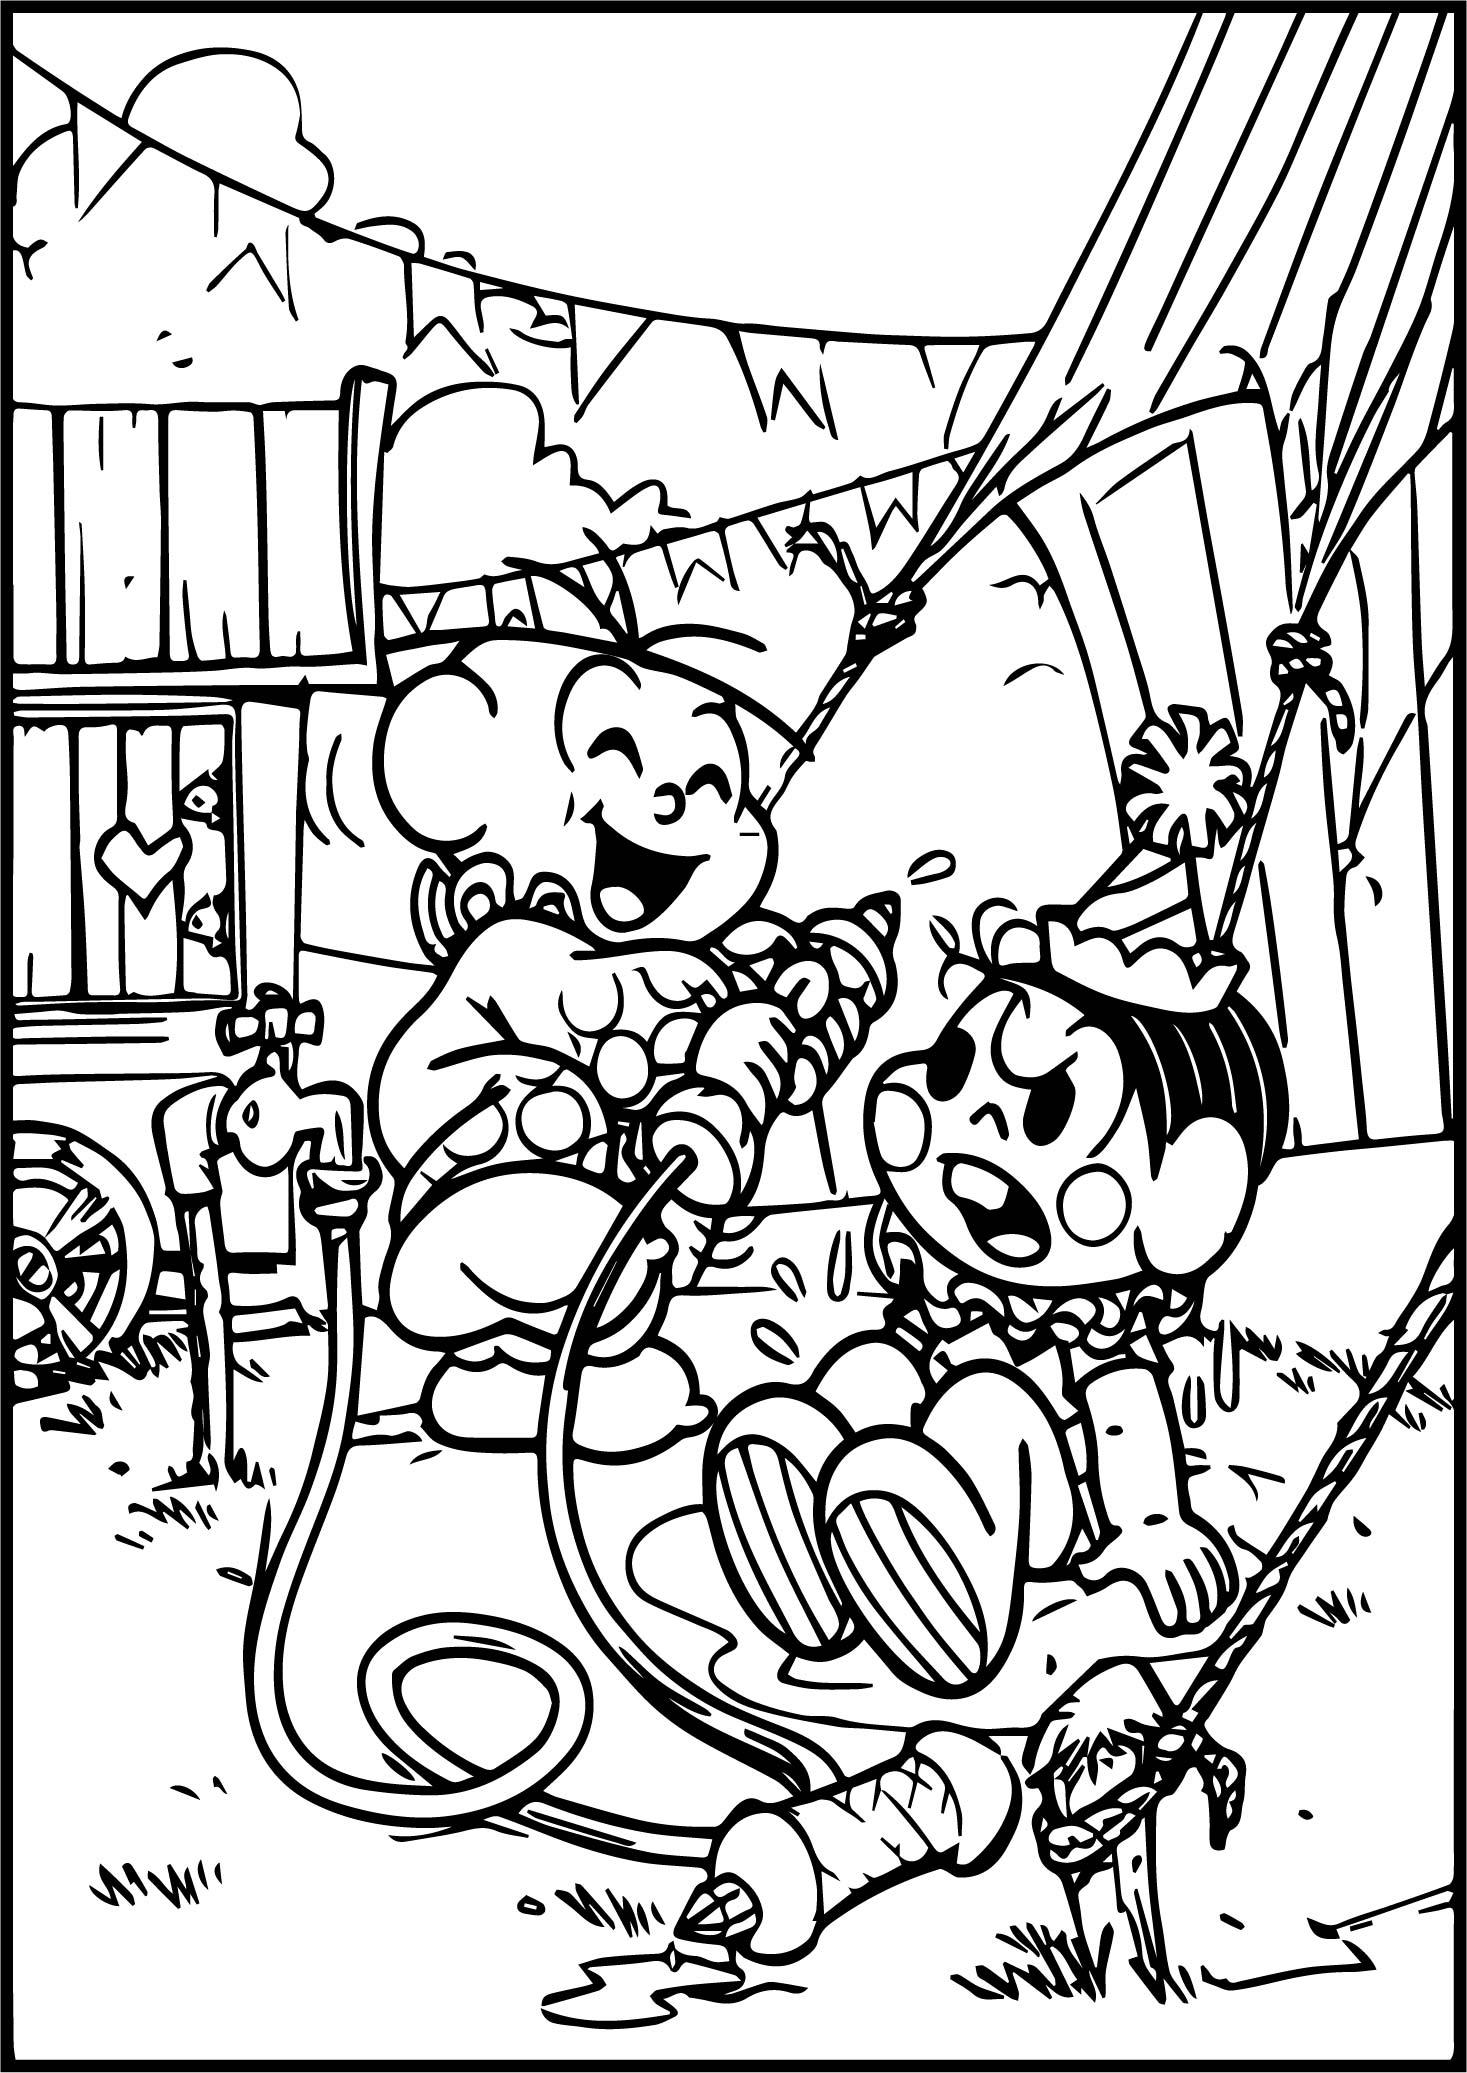 Turma Da Monica And Cascao Circus Joke Coloring Page